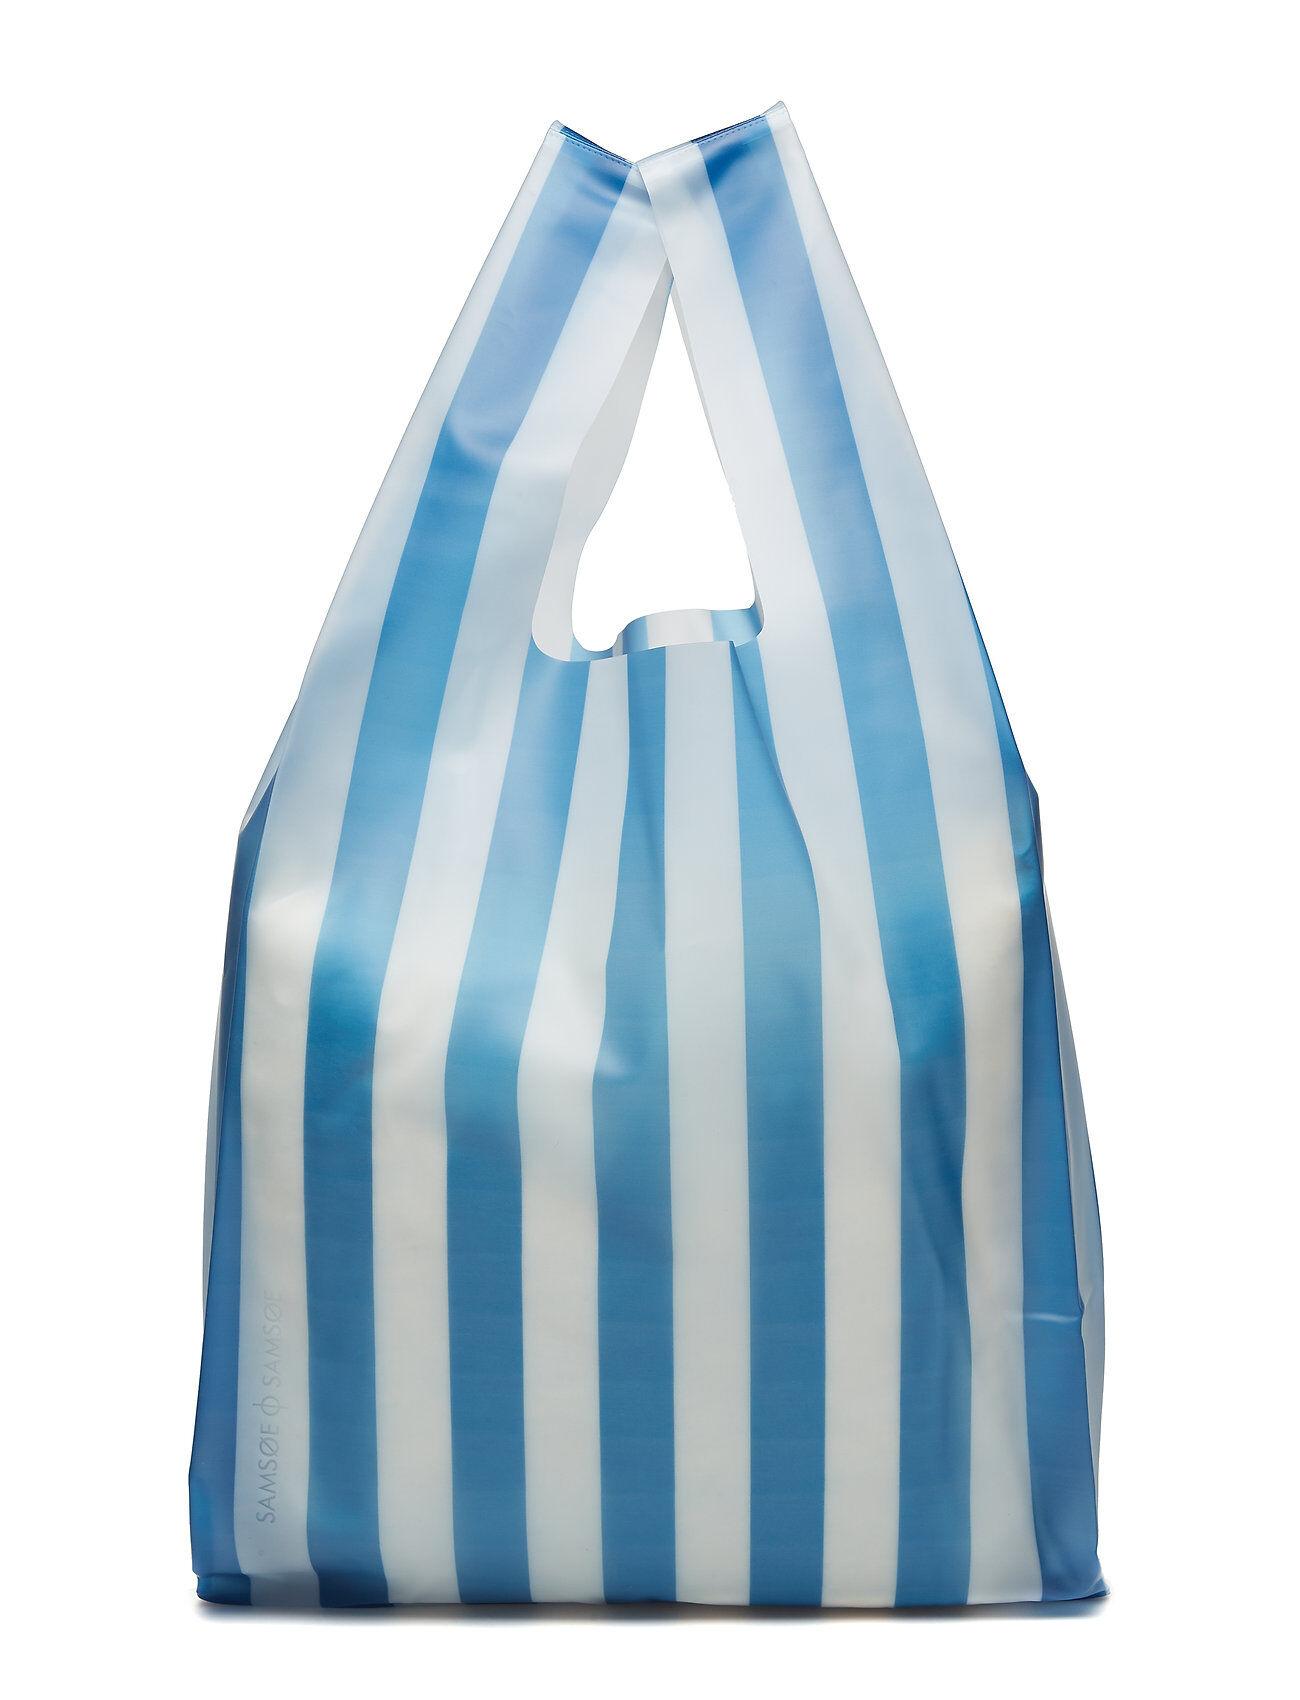 Samsøe & Samsøe Bethel Bag Aop 10560 Bags Shoppers Casual Shoppers Sininen